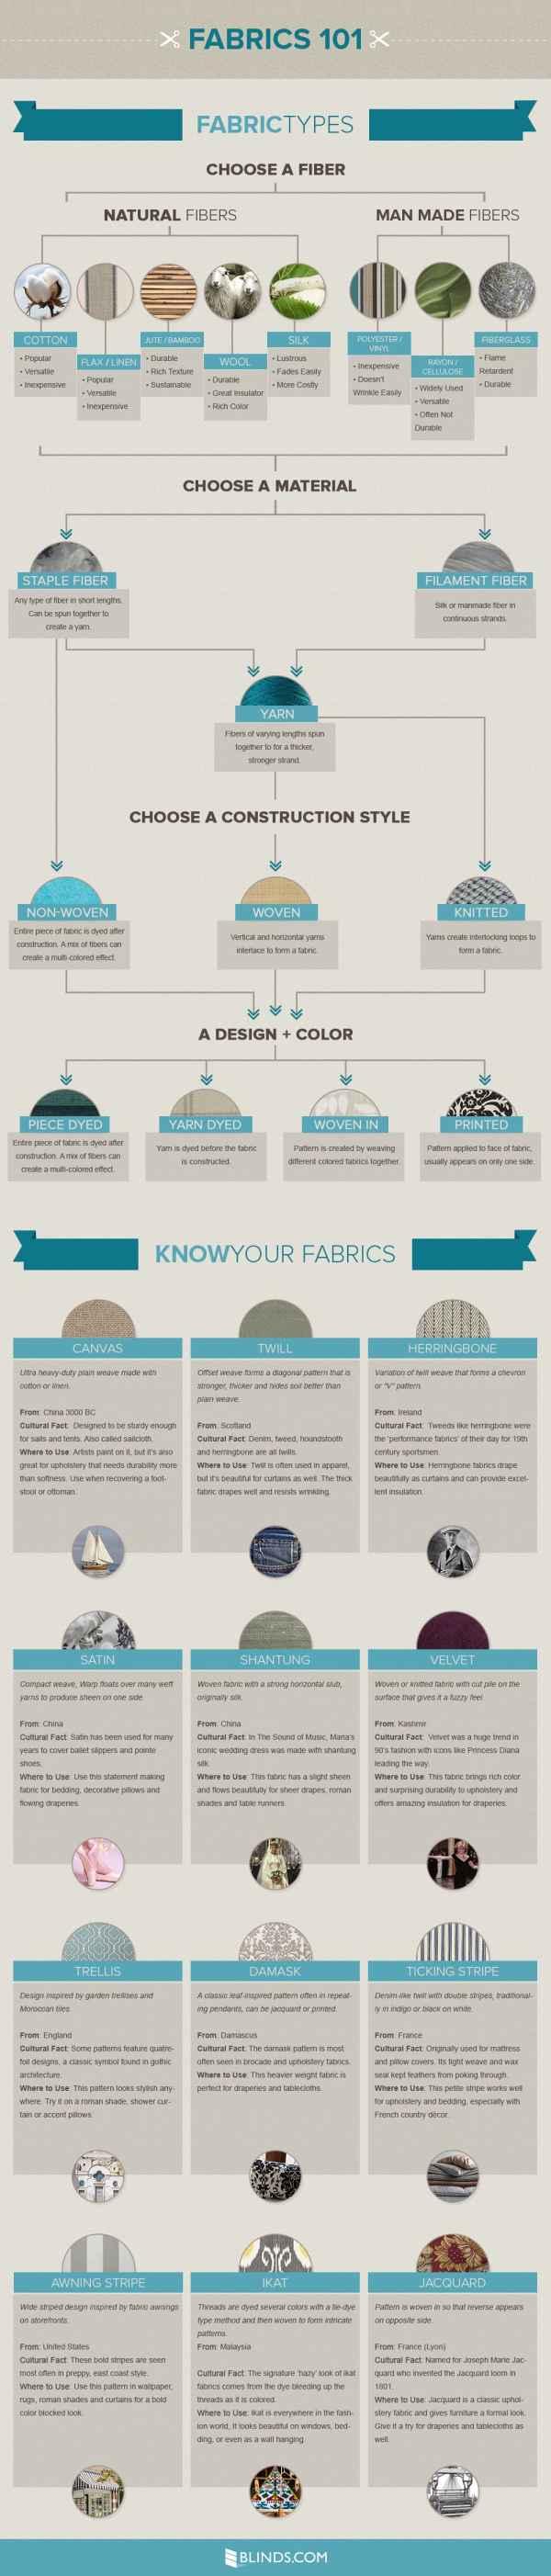 Fabrics 101 Inforgraphic